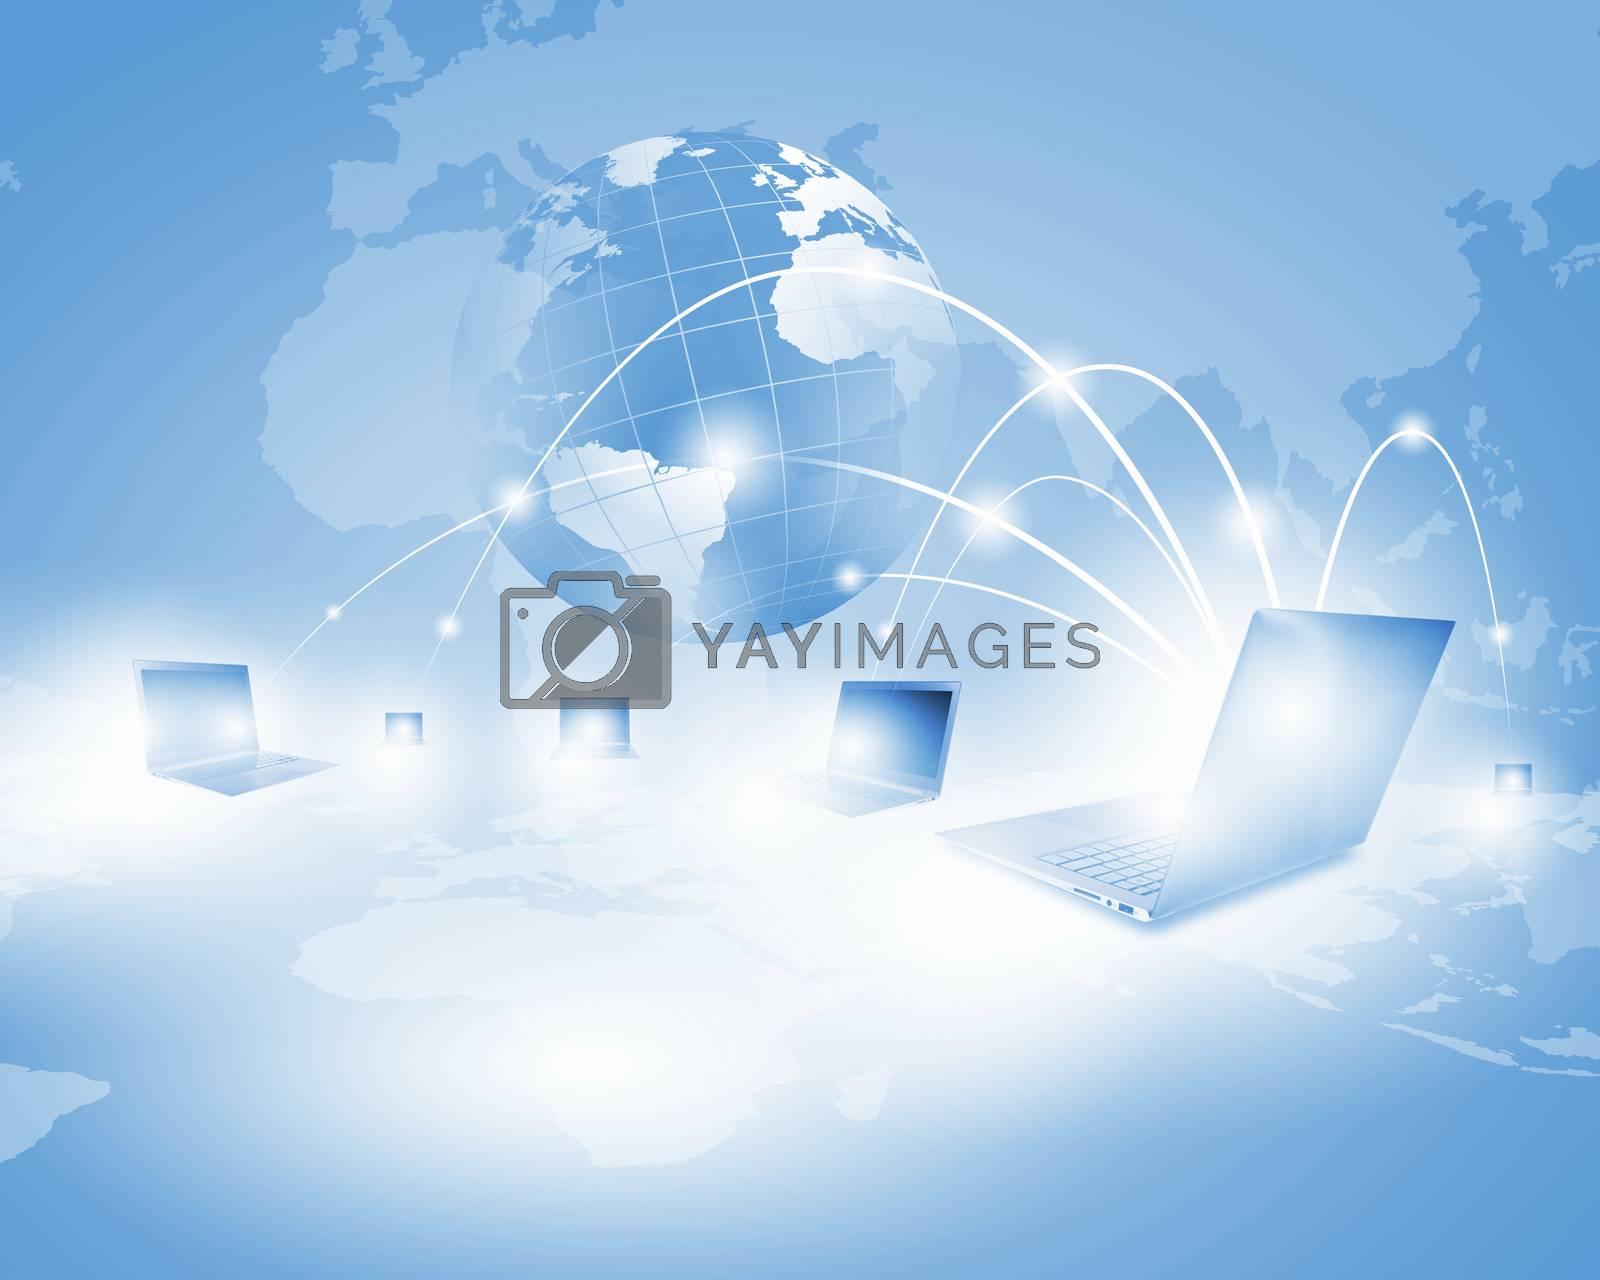 Image of laptop with globe illustration at background